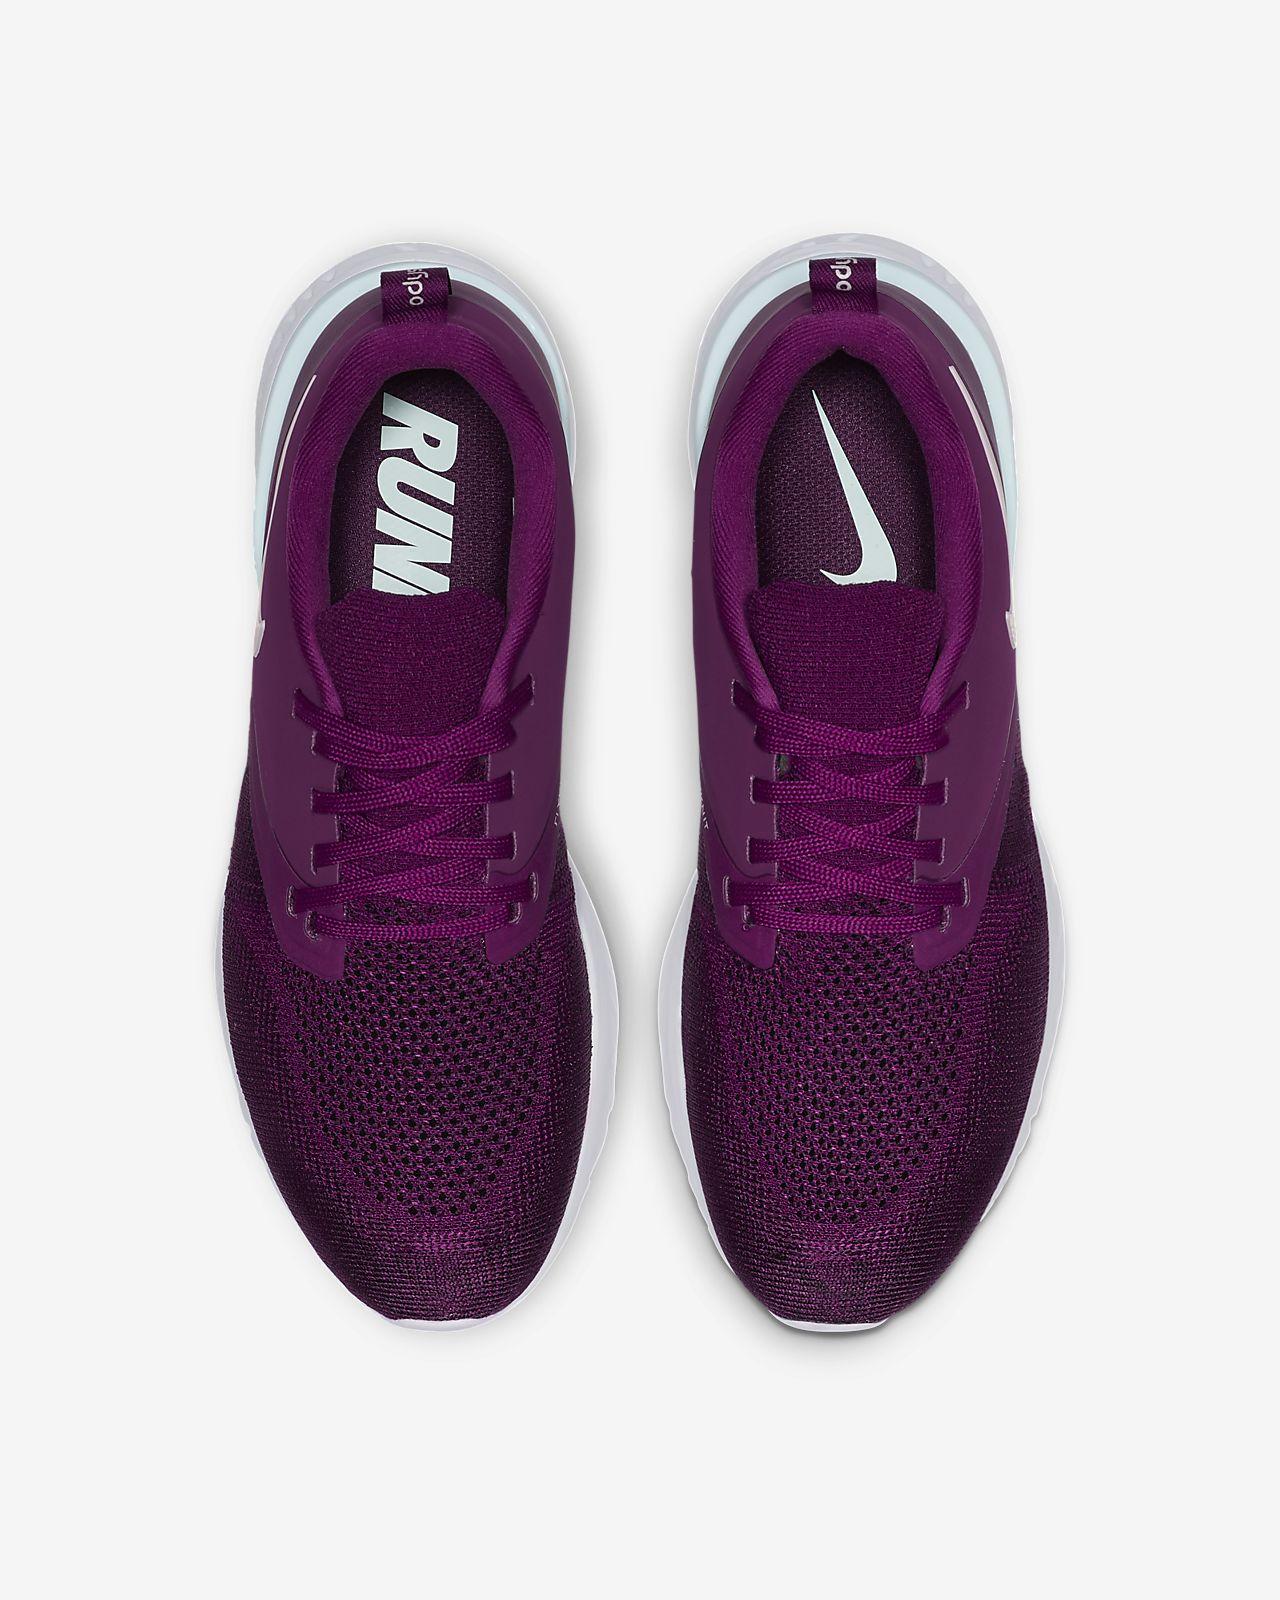 8fadb043db1f8 Nike Odyssey React Flyknit 2 Women s Running Shoe. Nike.com CH